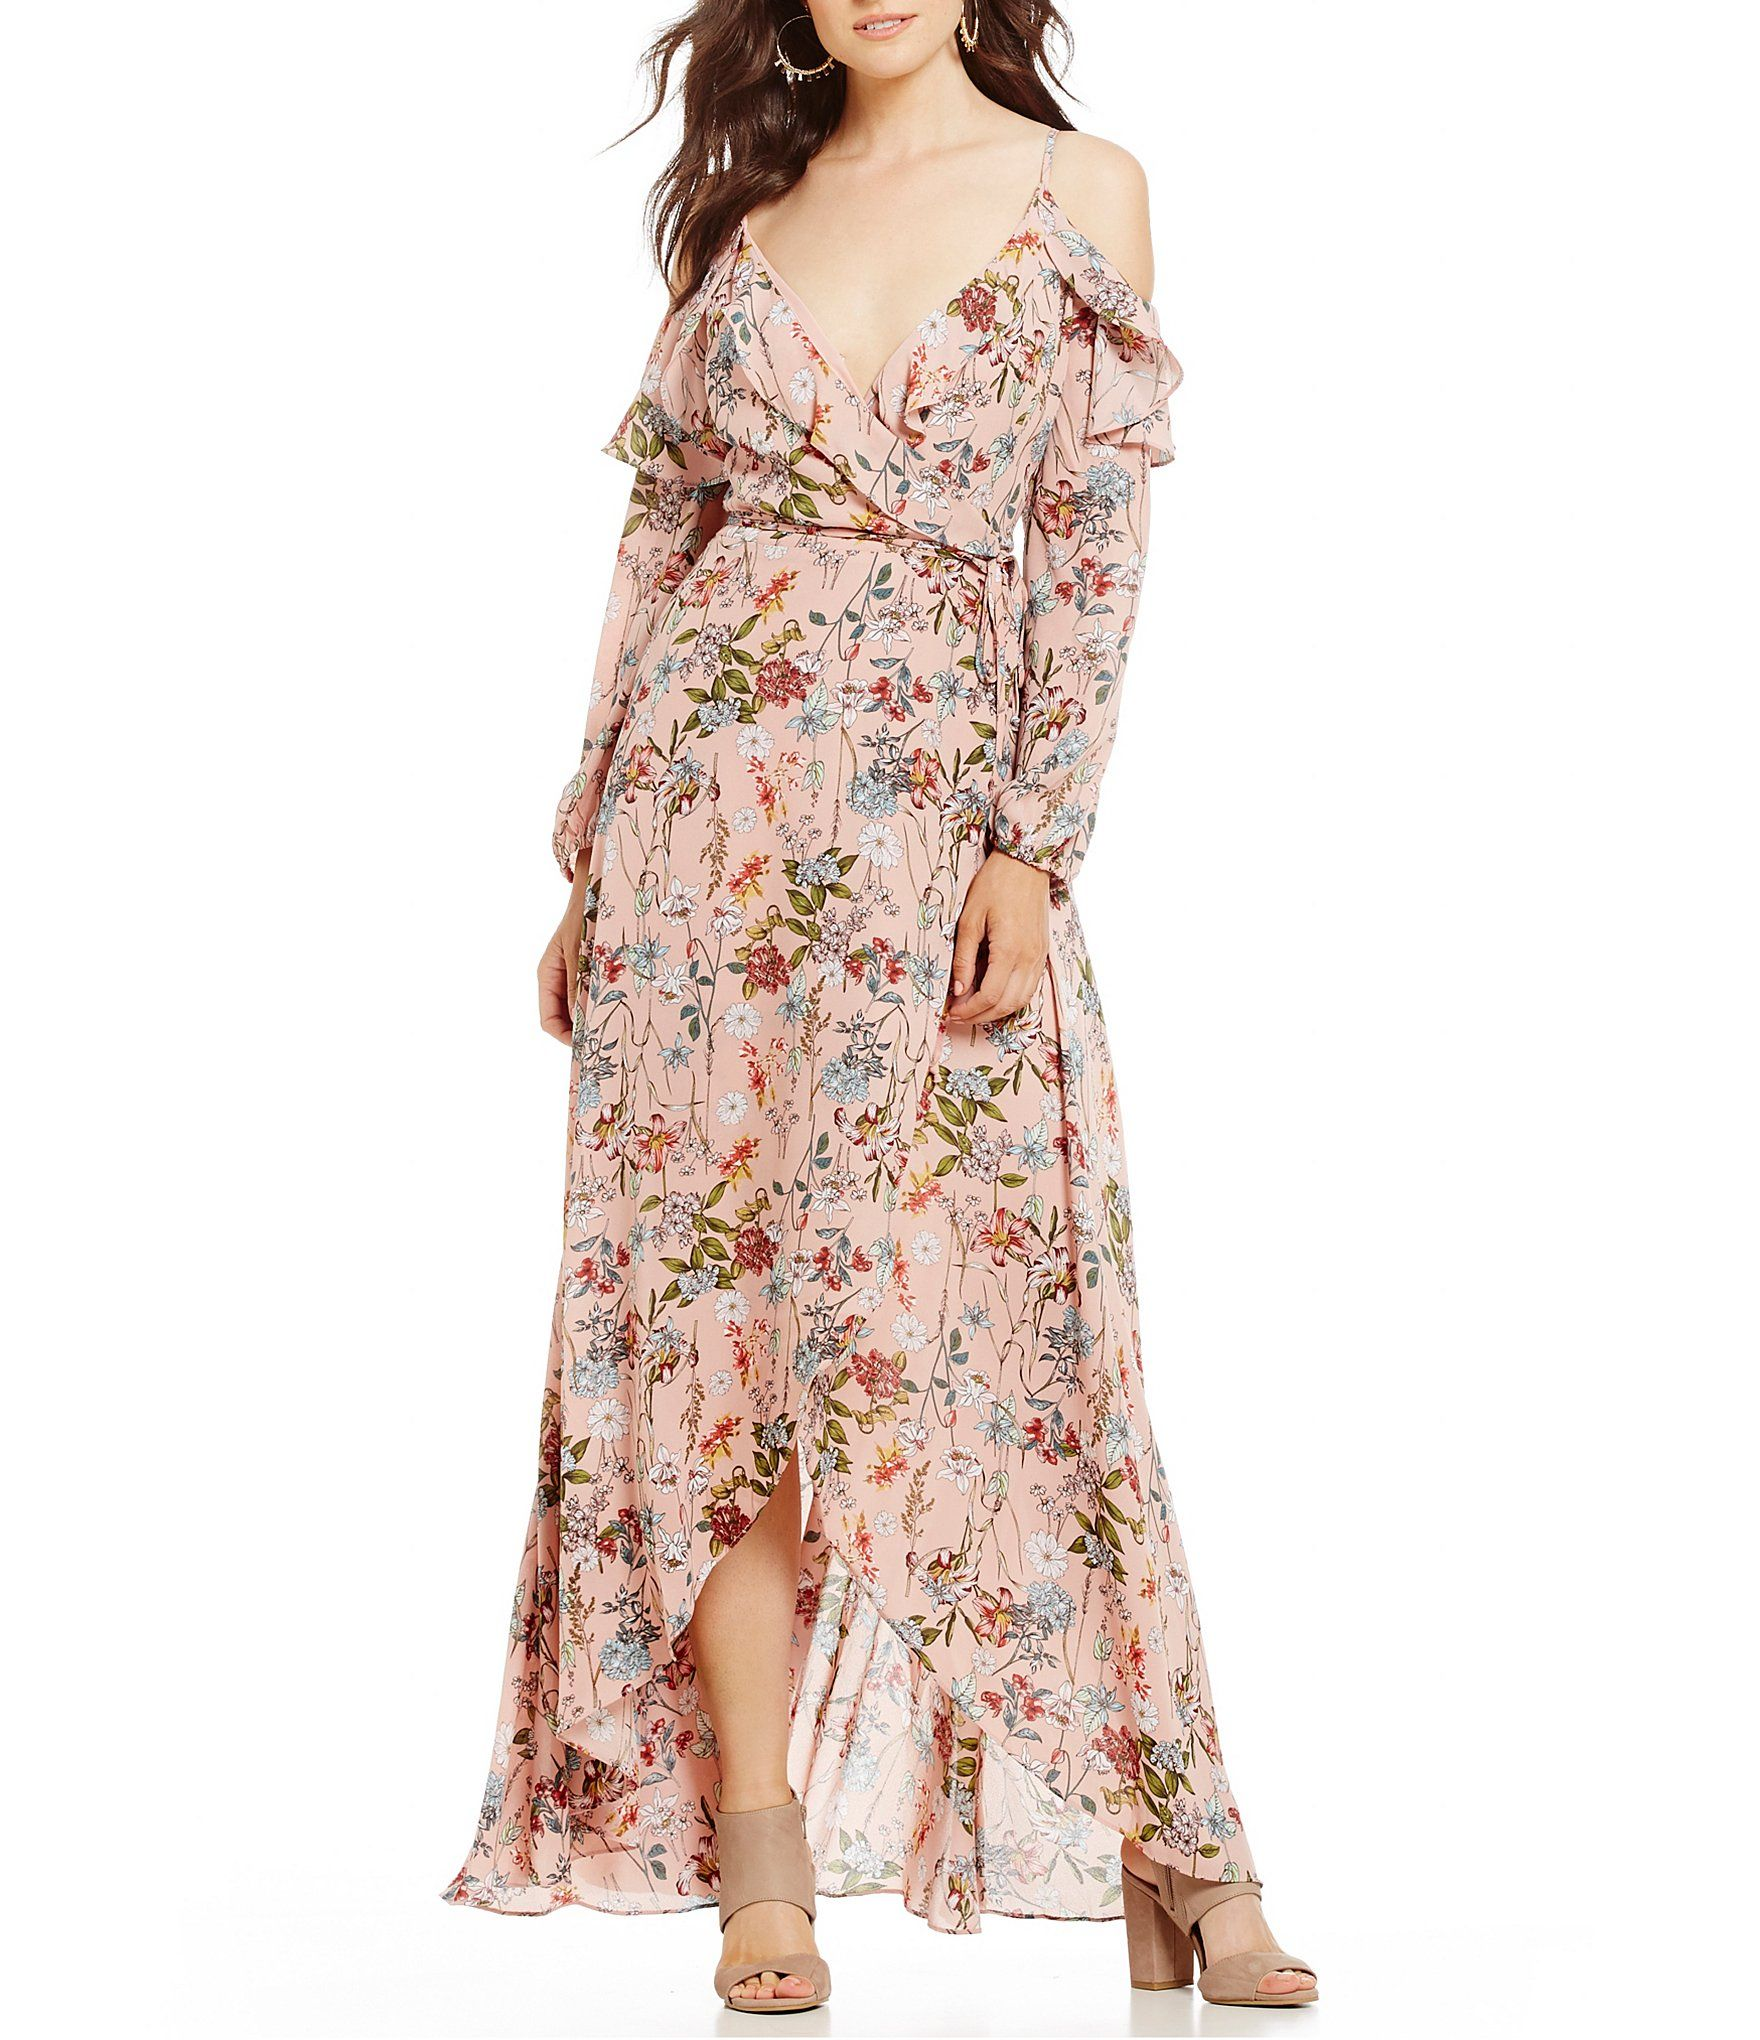 662a26c1cd8 Shop for GB Floral Wrap Maxi Dress at Dillards.com. Visit Dillards.com to  find clothing